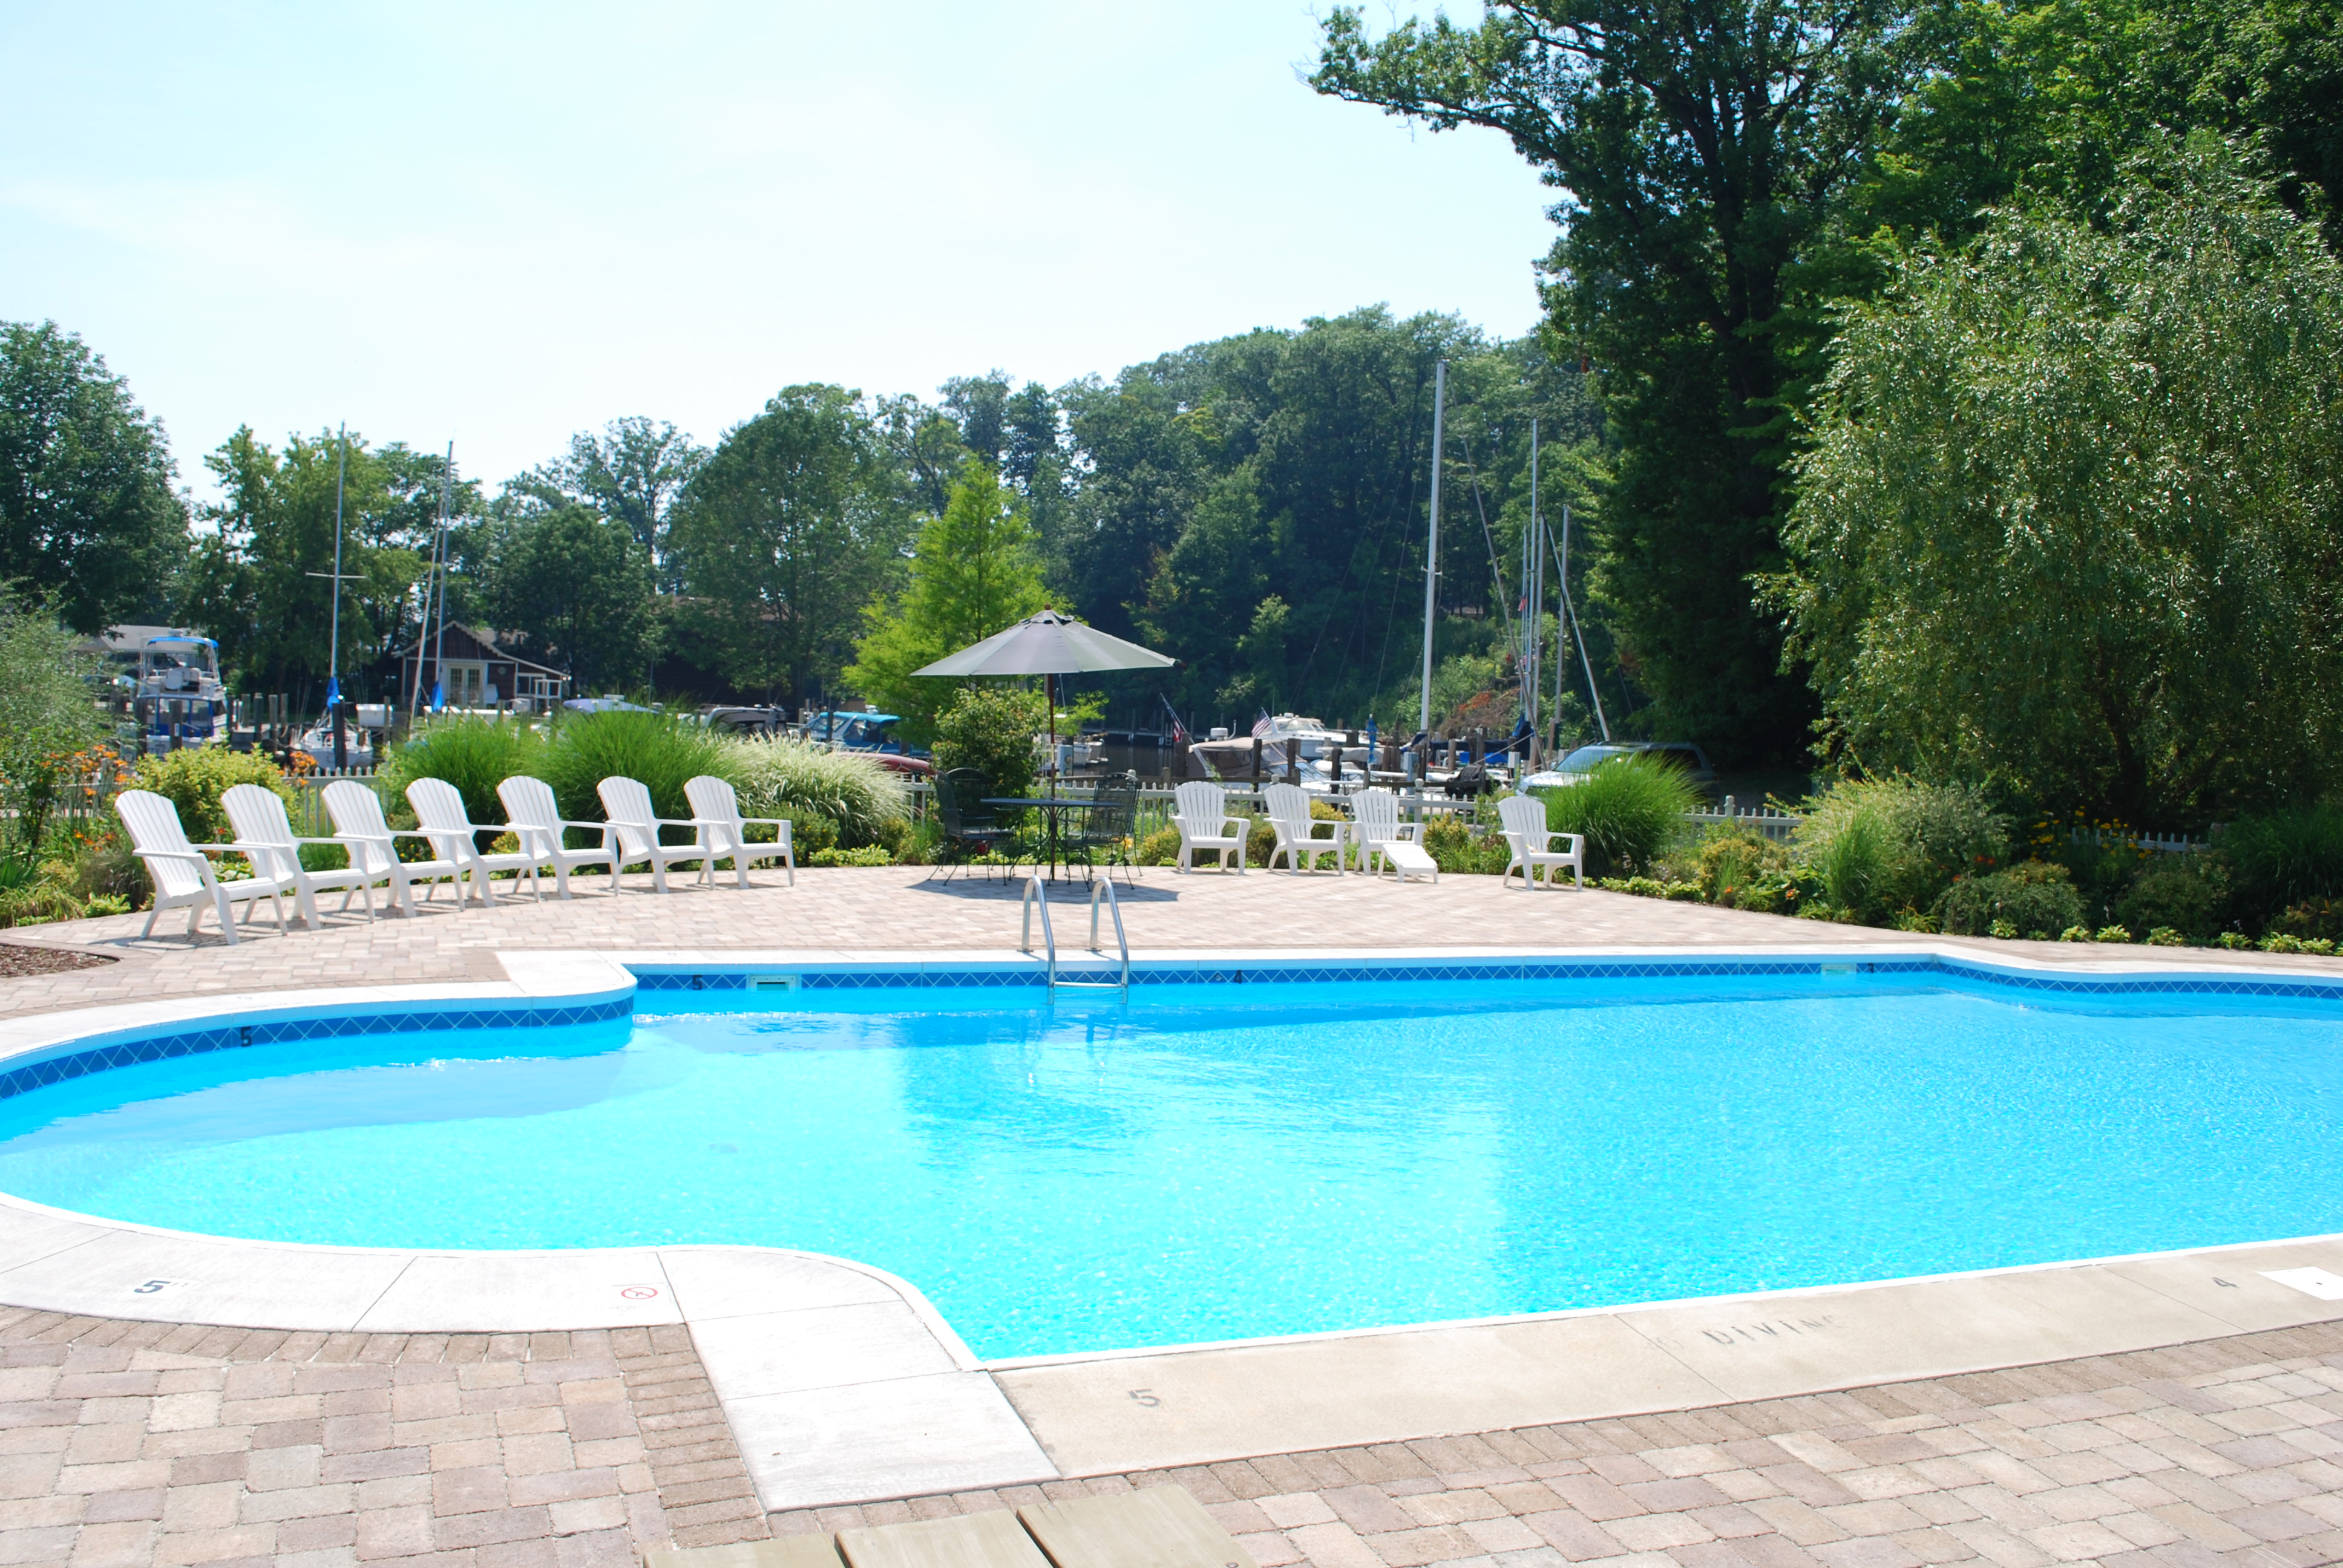 South Haven Marina pool